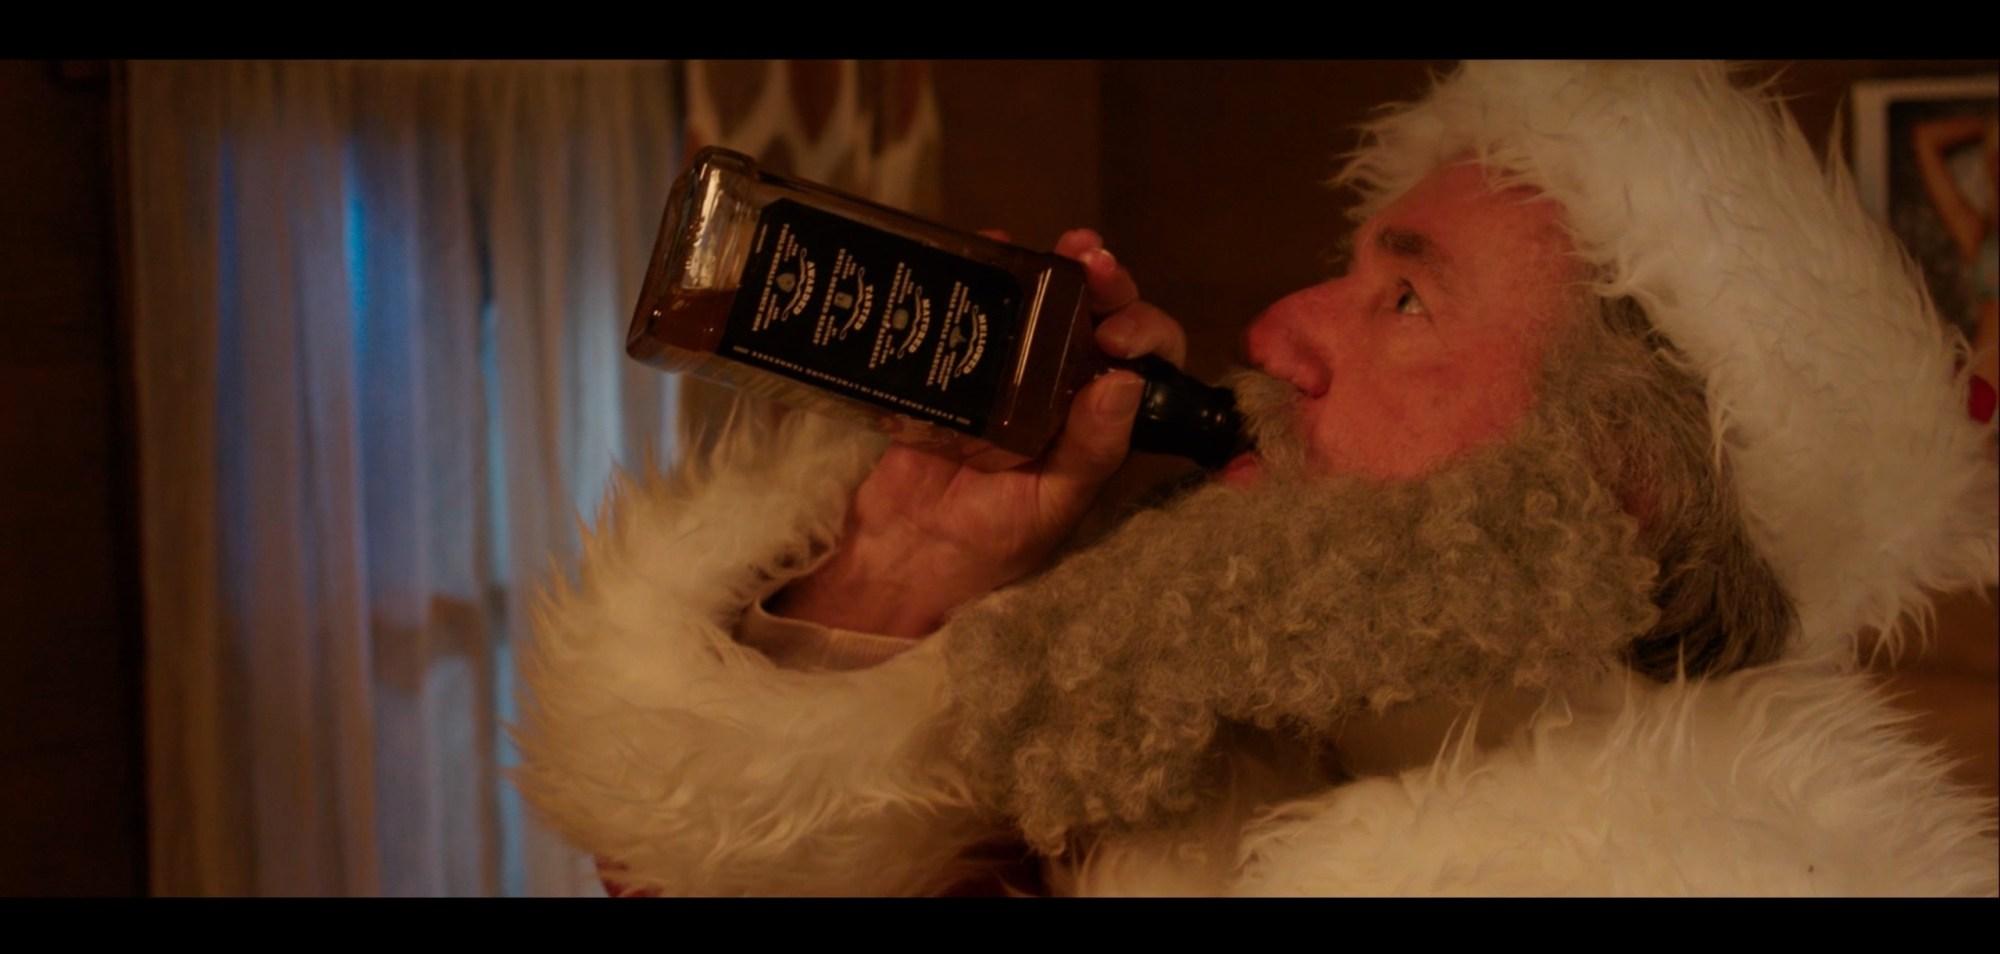 Still frame from The Naughty List short film of Santa swigging whiskey.